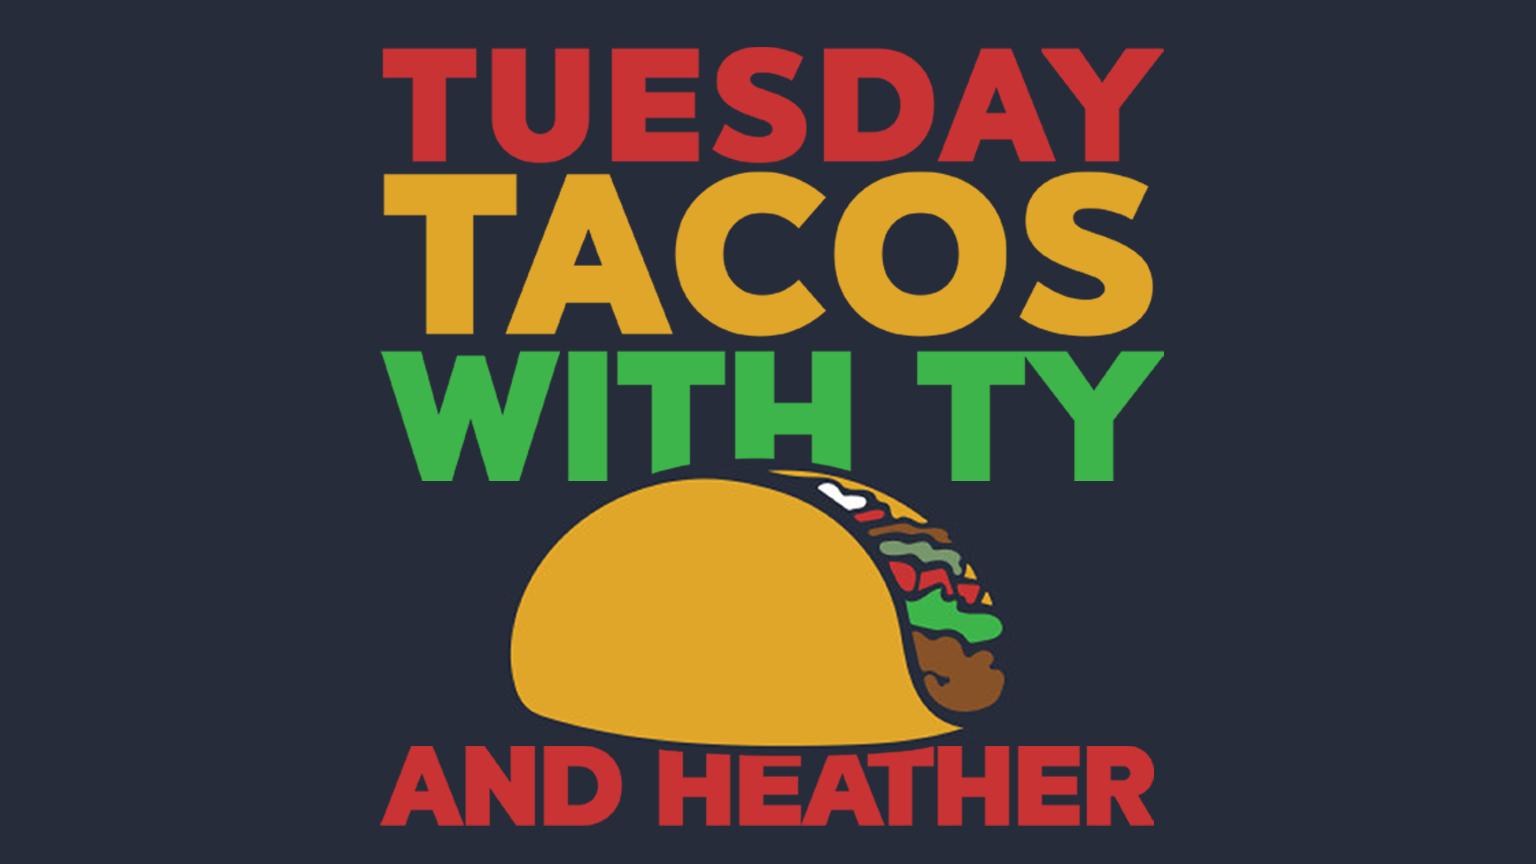 Tuesdaytaco